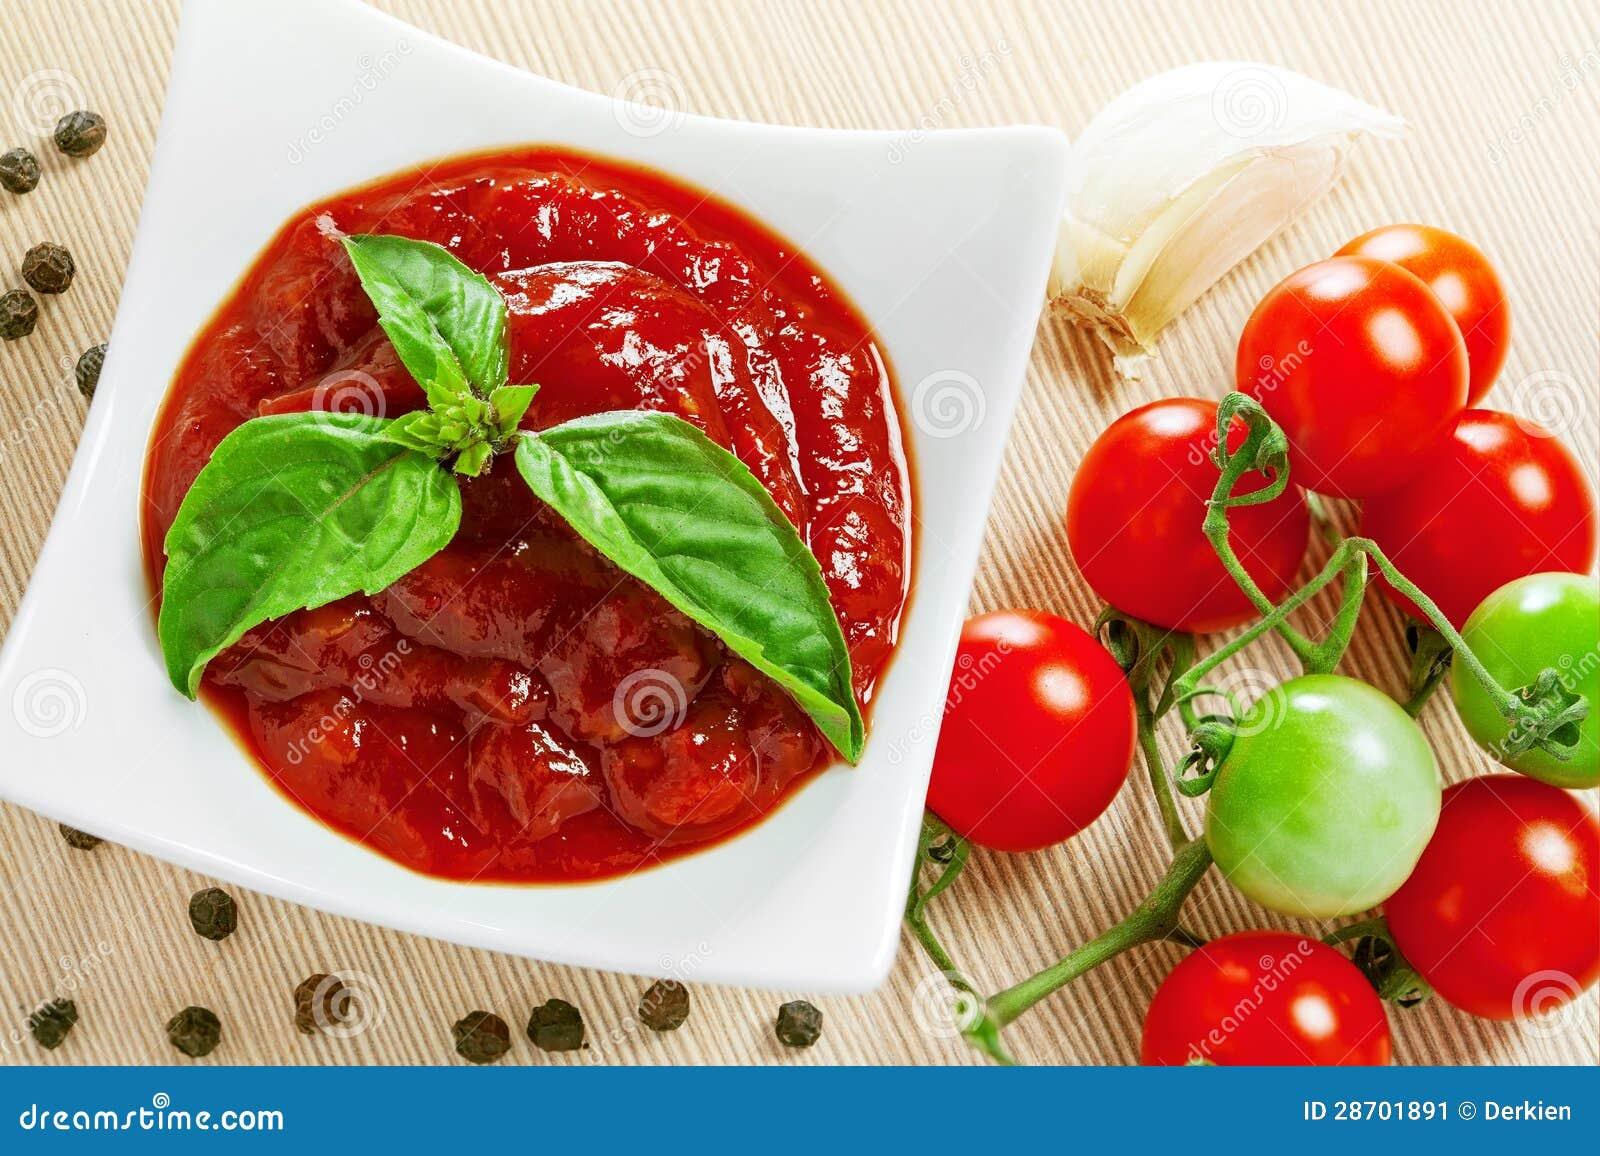 Red Tomato Sauce Stock Image - Image: 28701891